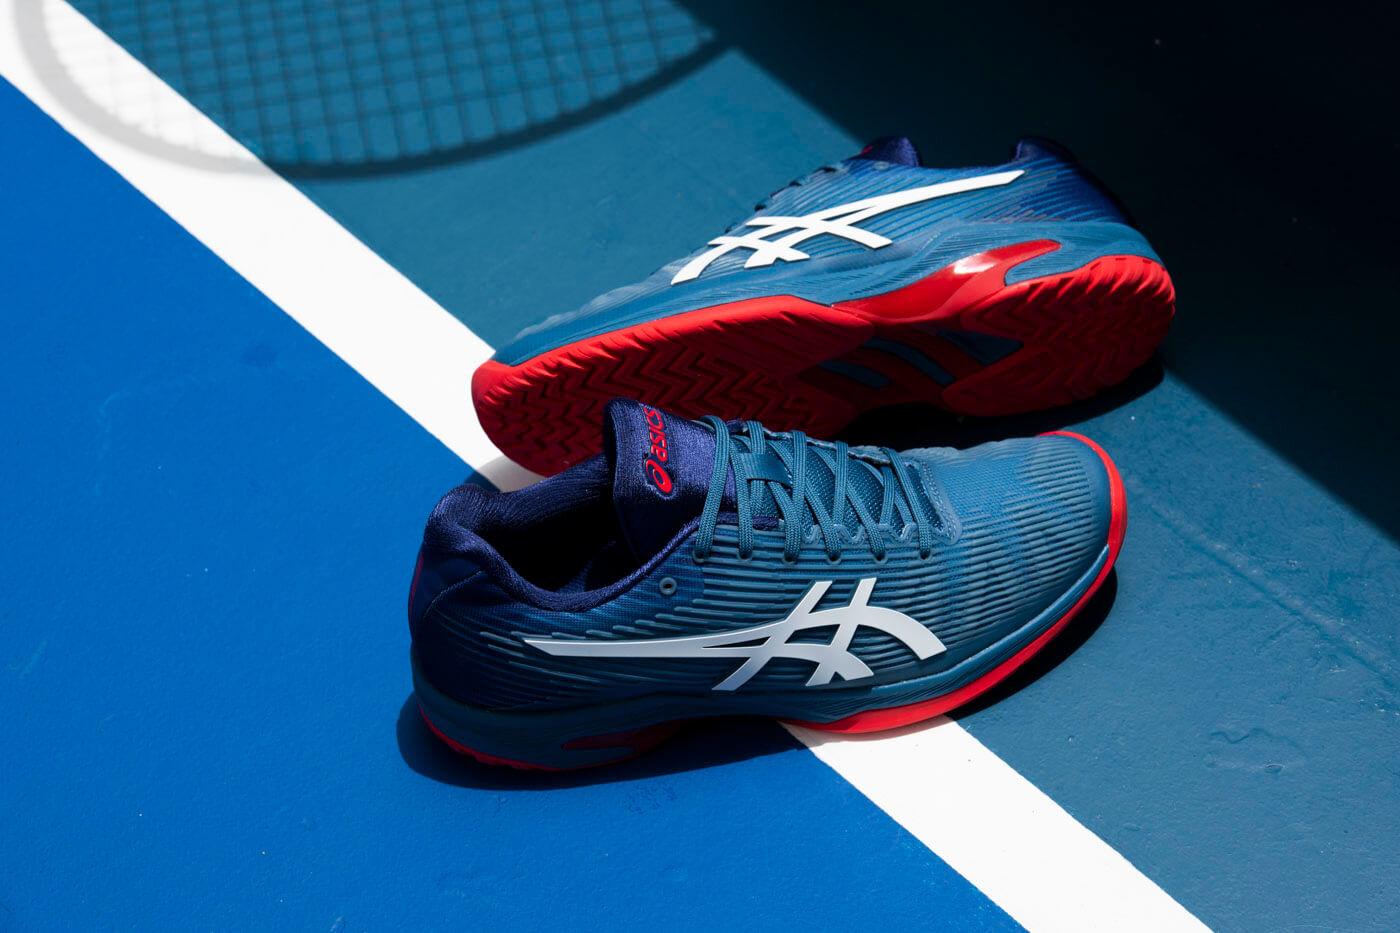 Asics Novak Djokovic Nabs Wimbledon As The Brand Launches Solution Speed Ff Tennis Footwear Niche Out Marketing Opportunities Arch Usa